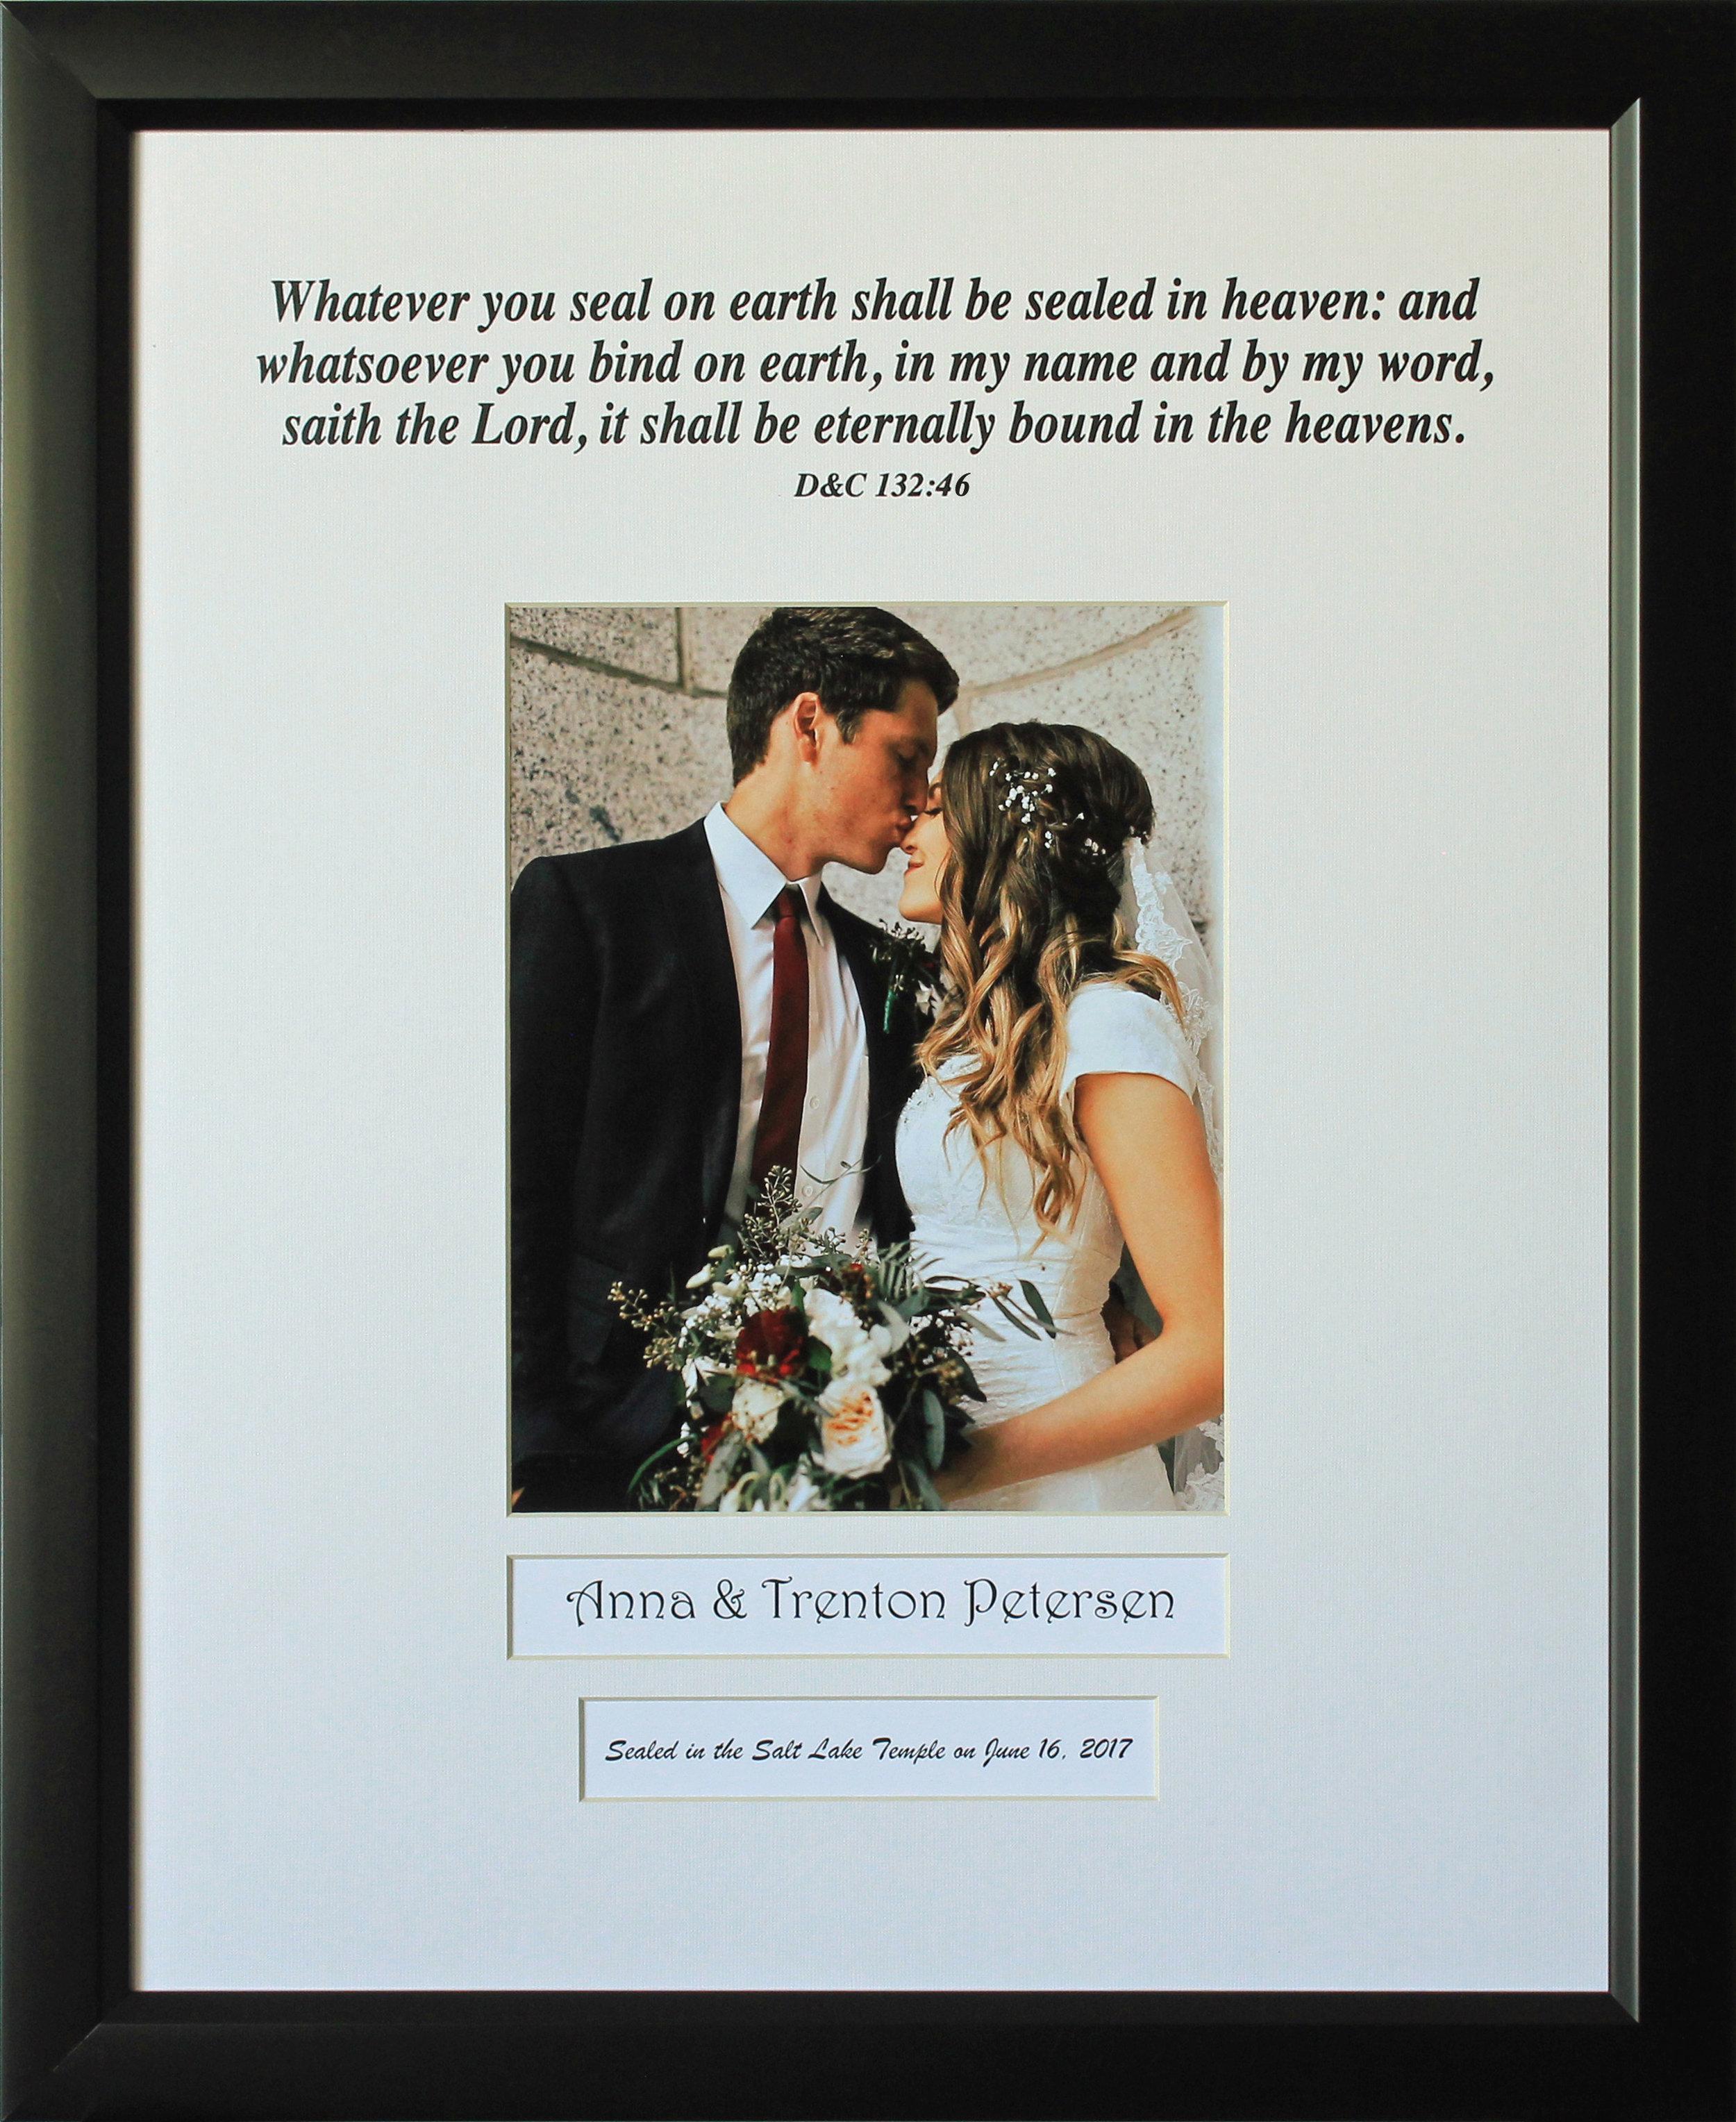 Wedding (Anna _ Trenton) - 16x20 (white).jpg